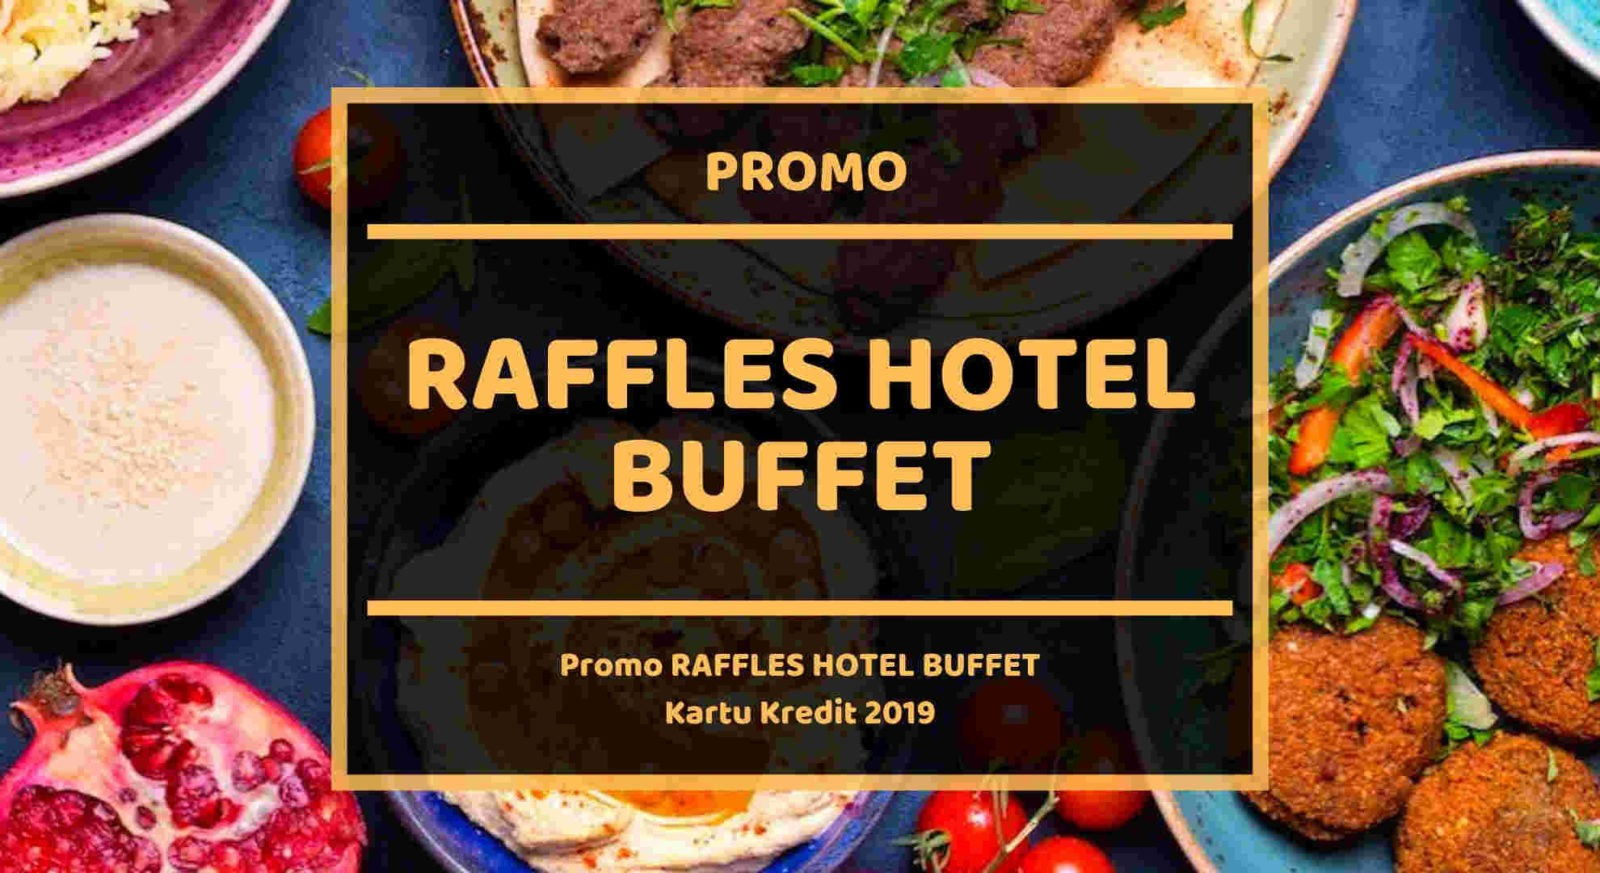 Promo Raffles Hotel Buffet Kartu Kredit Disc Up To 50 Travelspromo